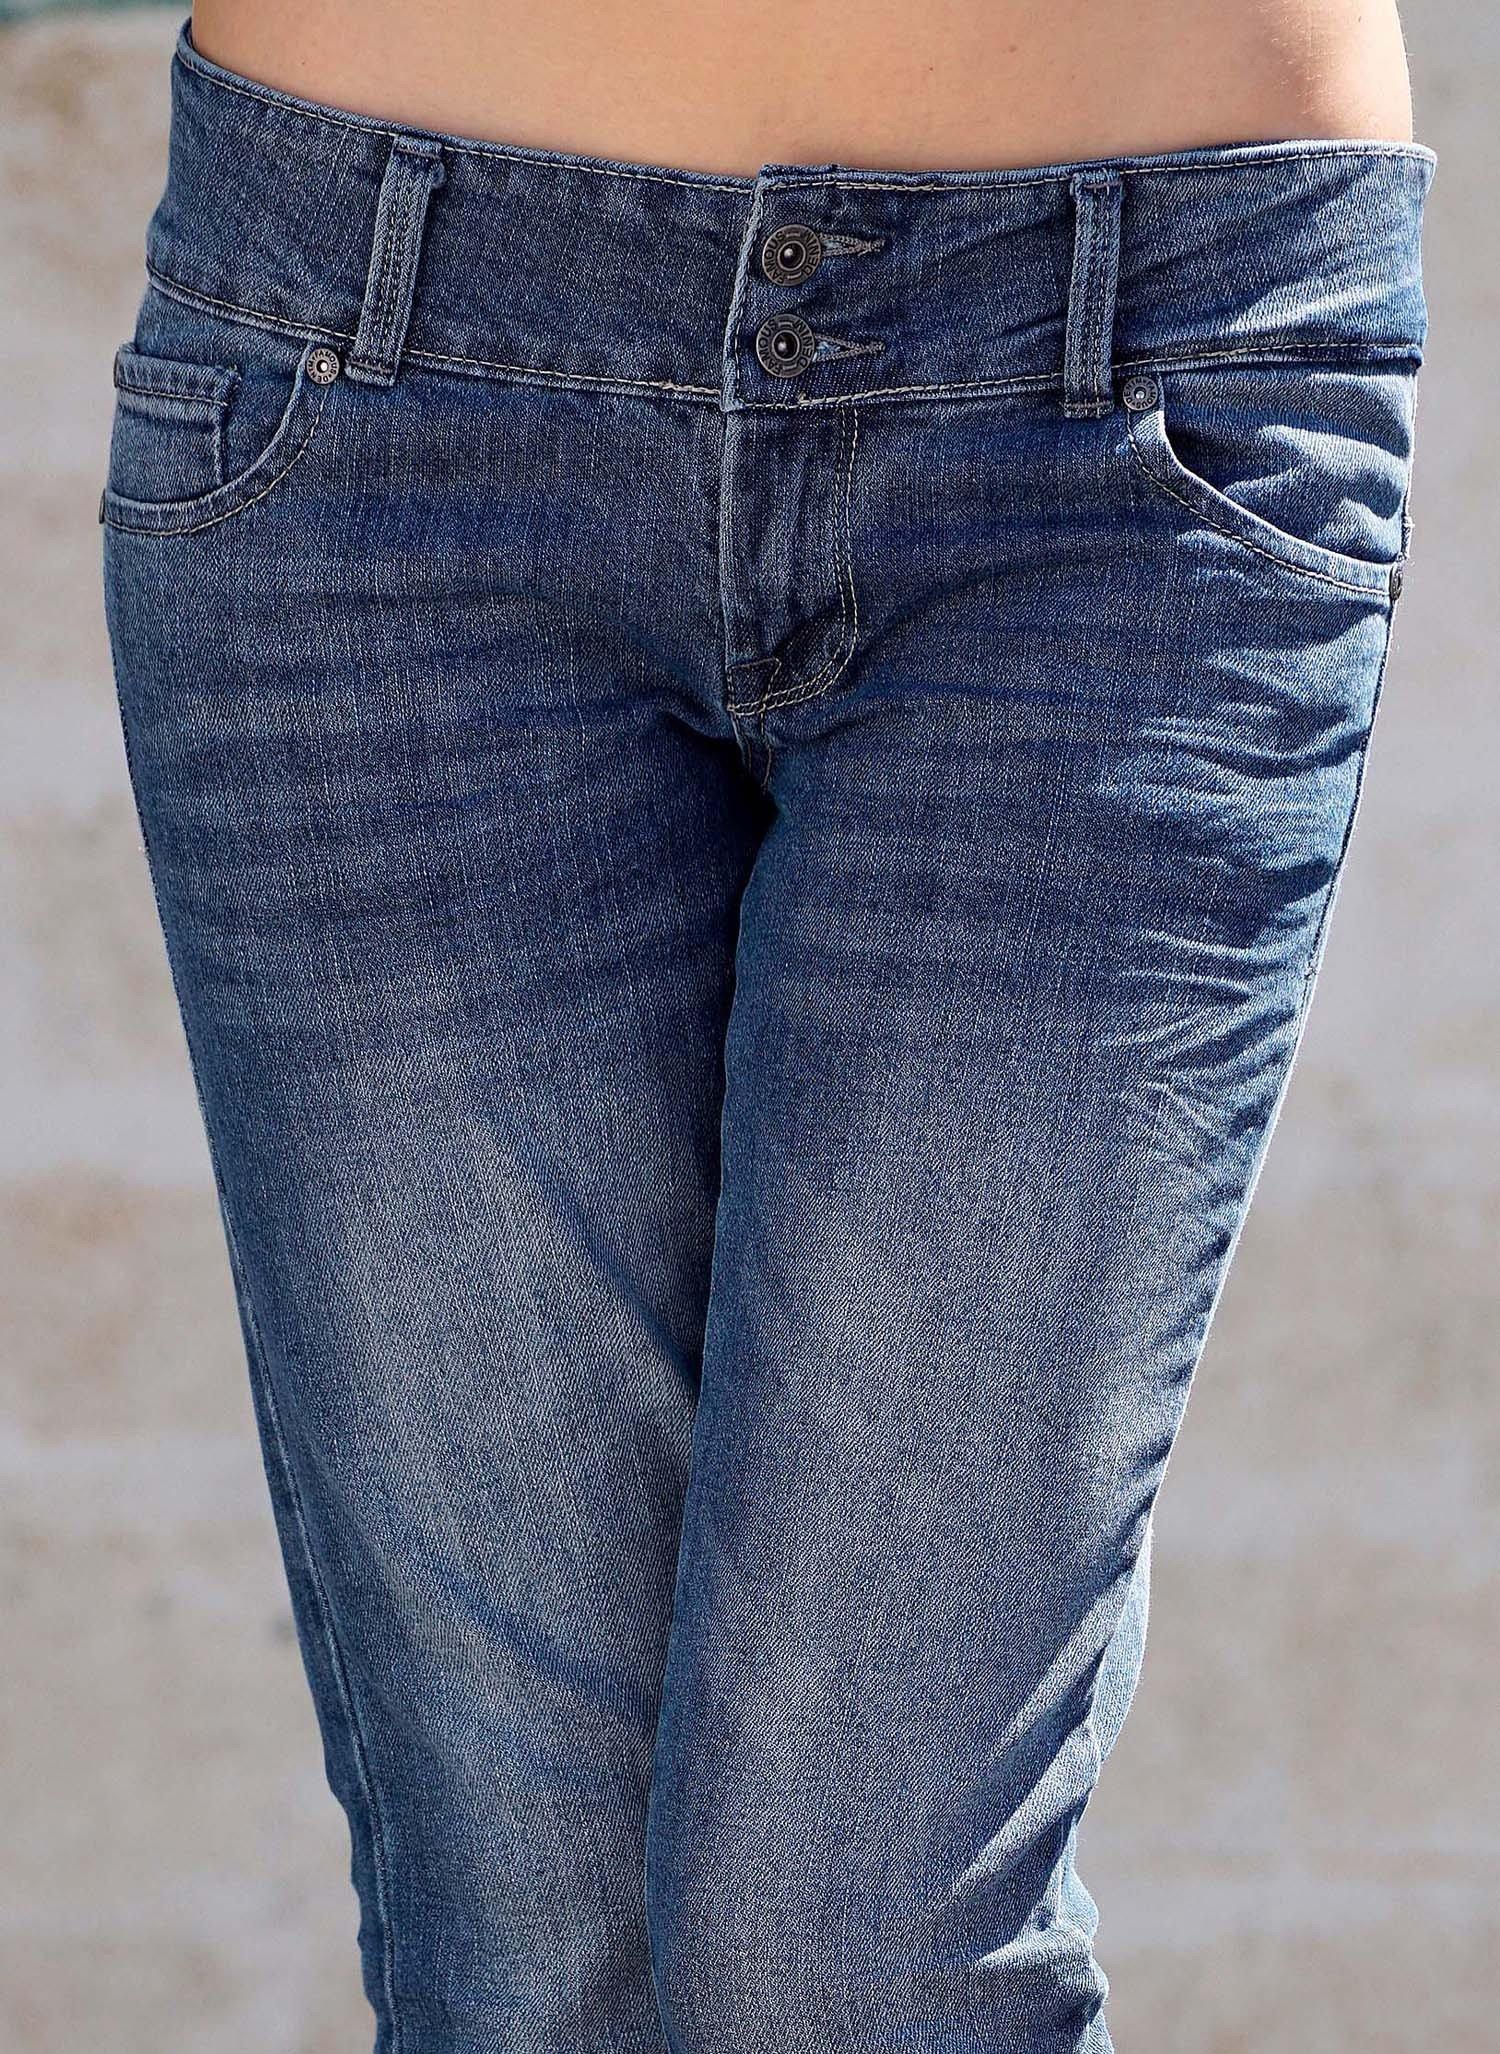 D-7P-Jeans,dopp.Knopf Blue-Den 44 050 - 2 - Ronja.ch